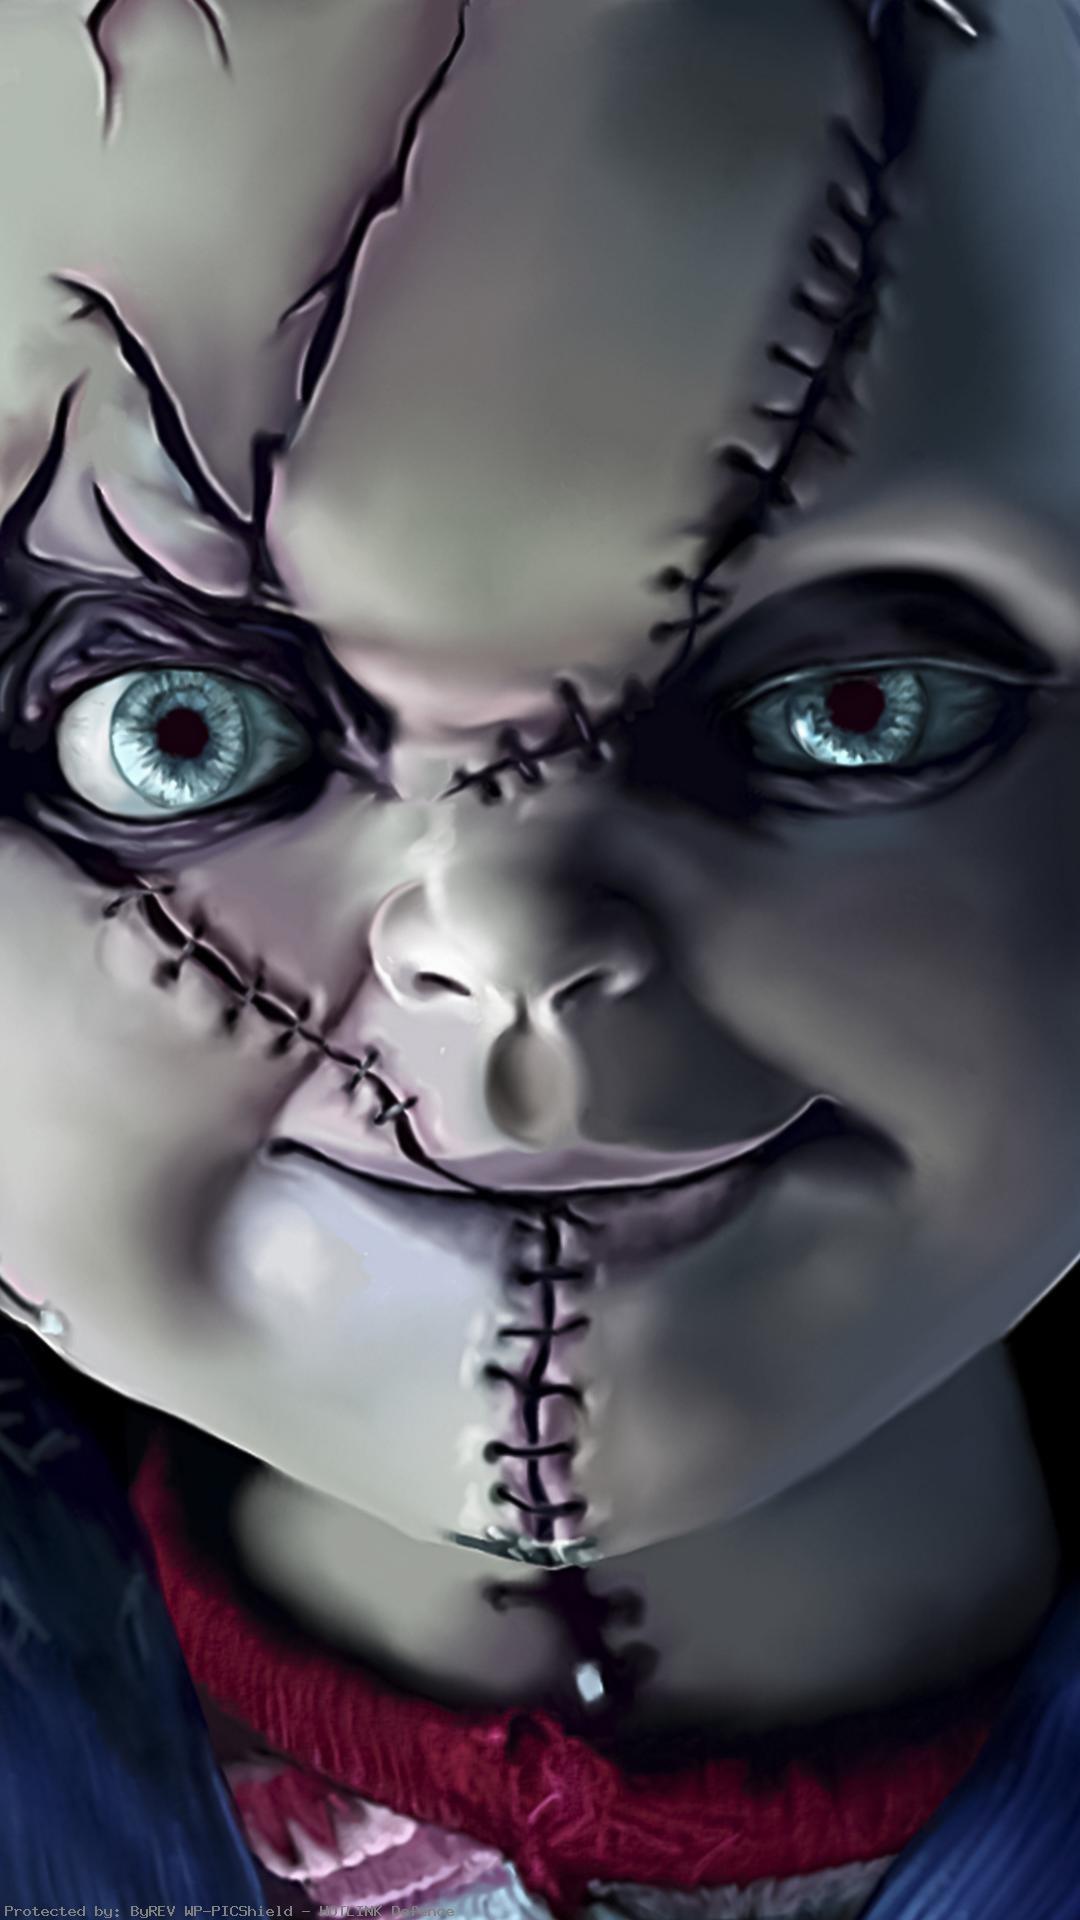 Chucky-doll-scary-nope-halloween-horrormovies-wallpaper-wp4403477